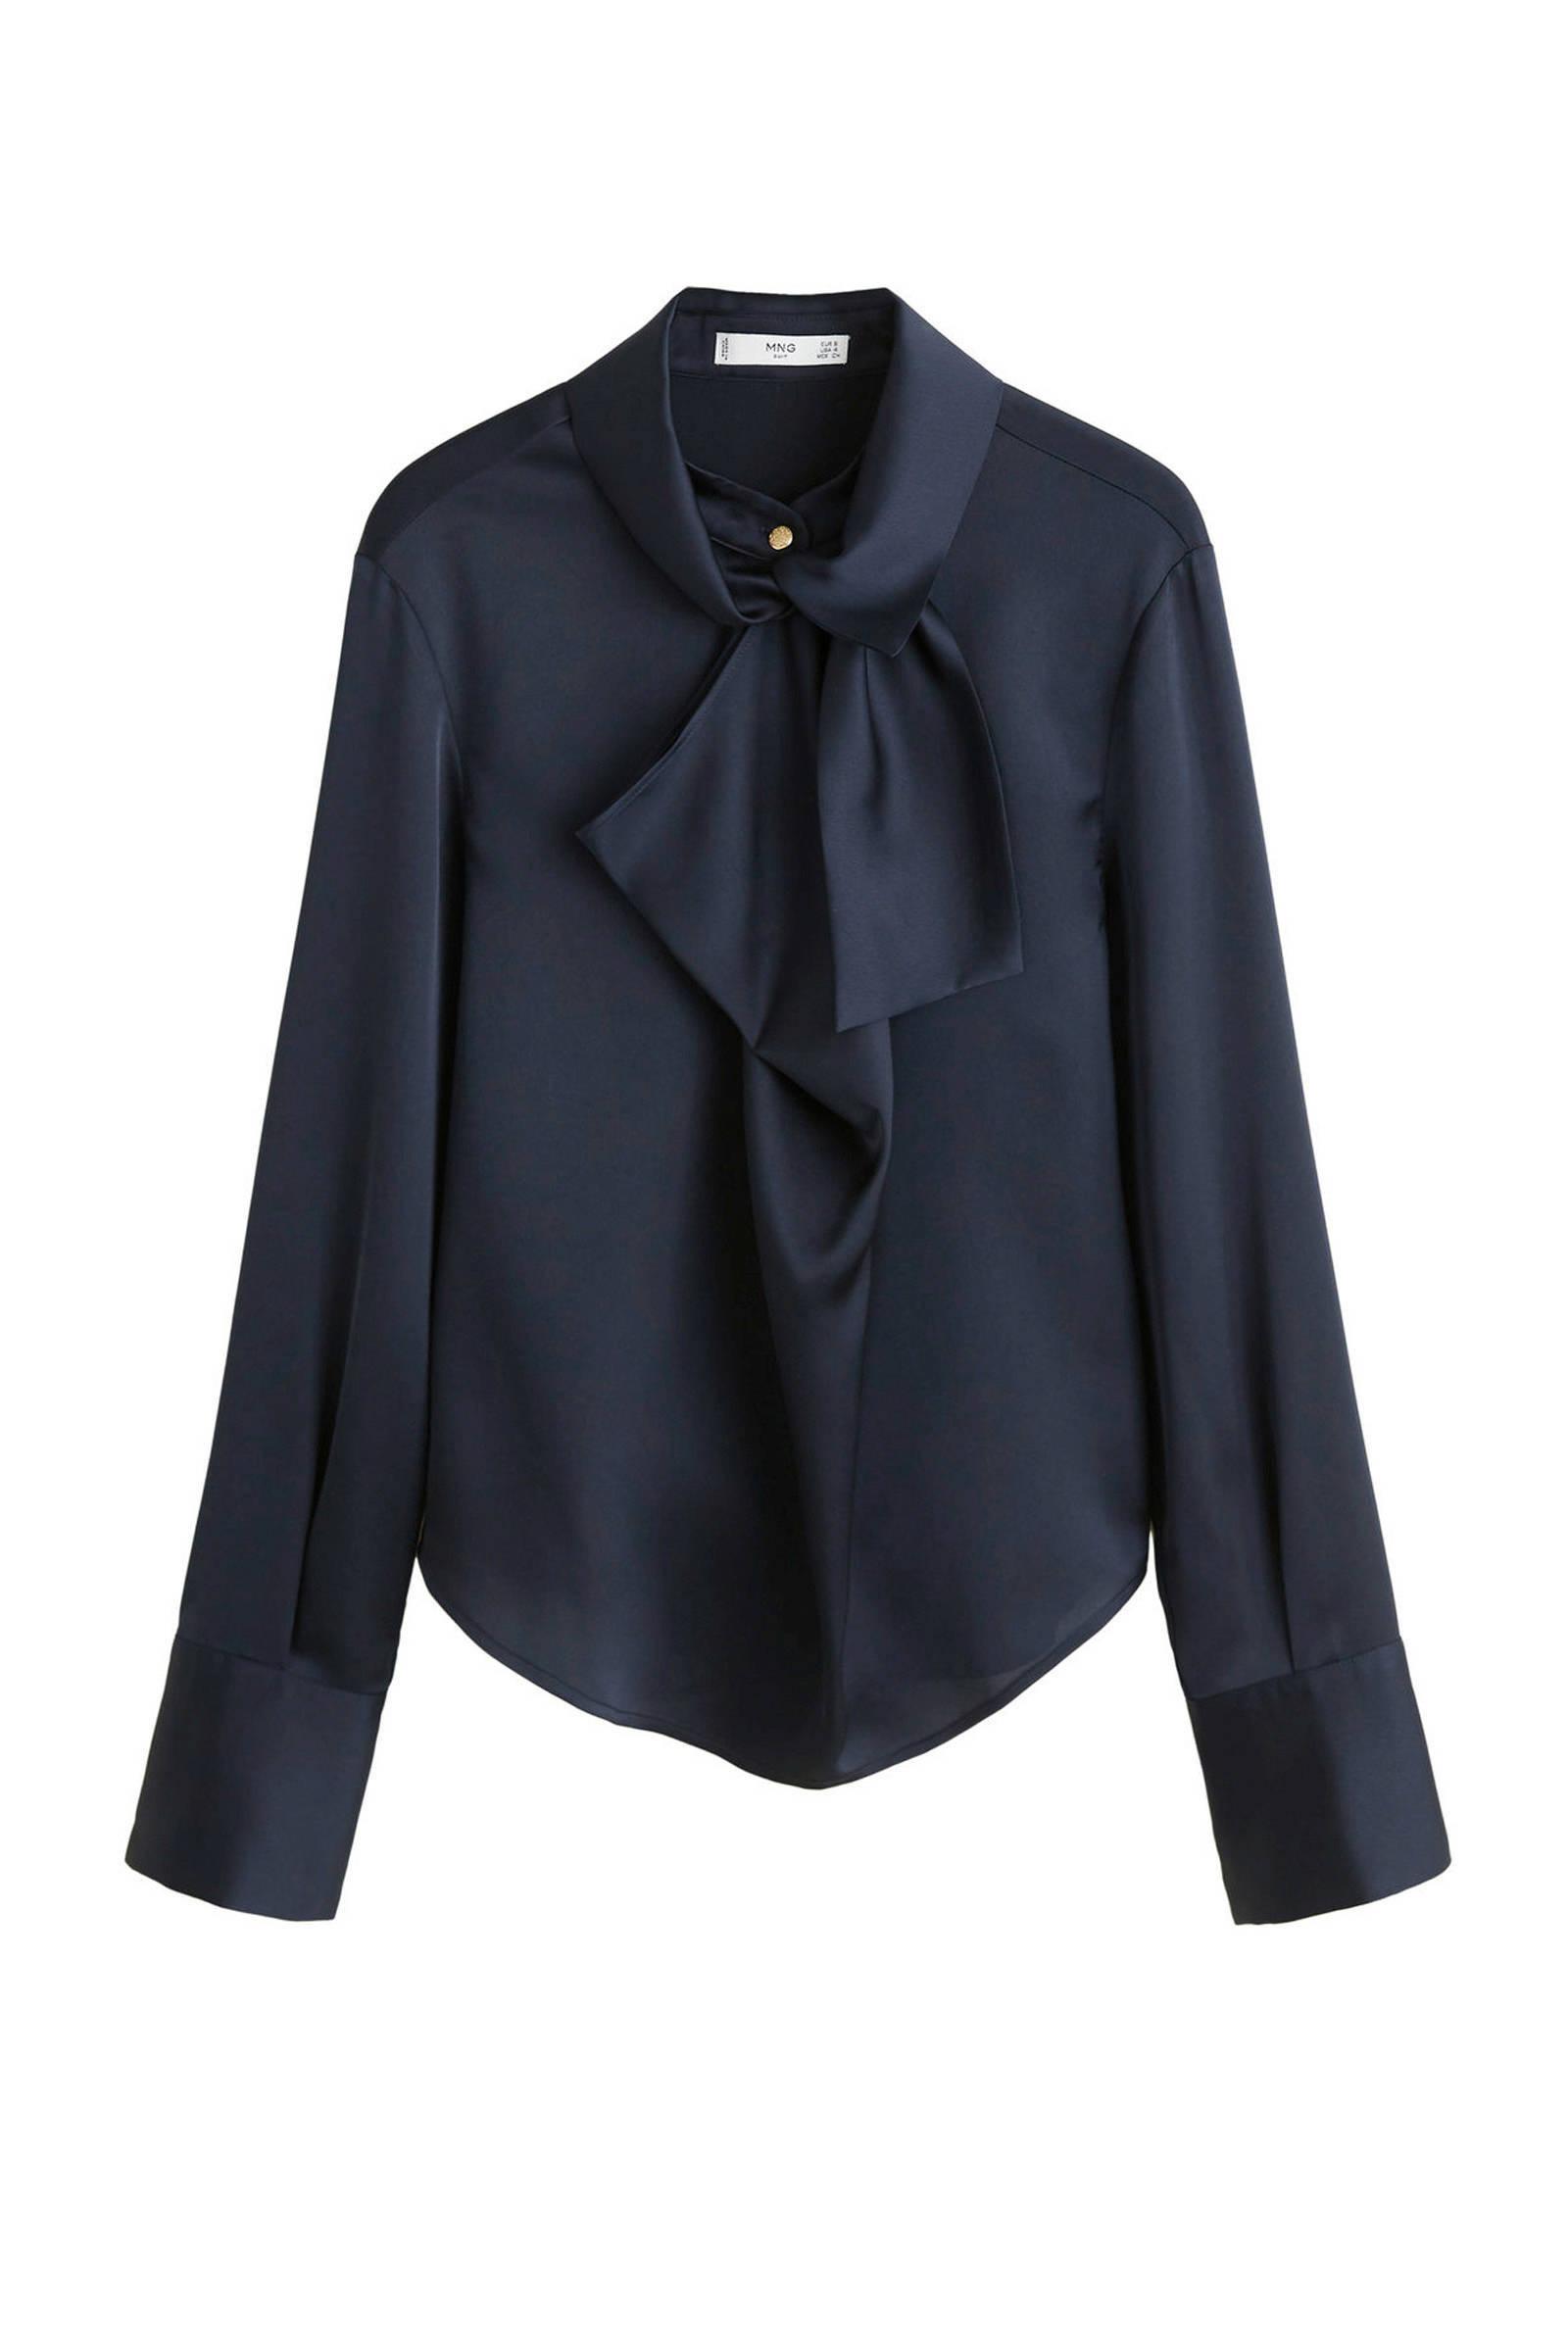 blouse strikkraag Mango satijnen marine met 4Tq4z7B